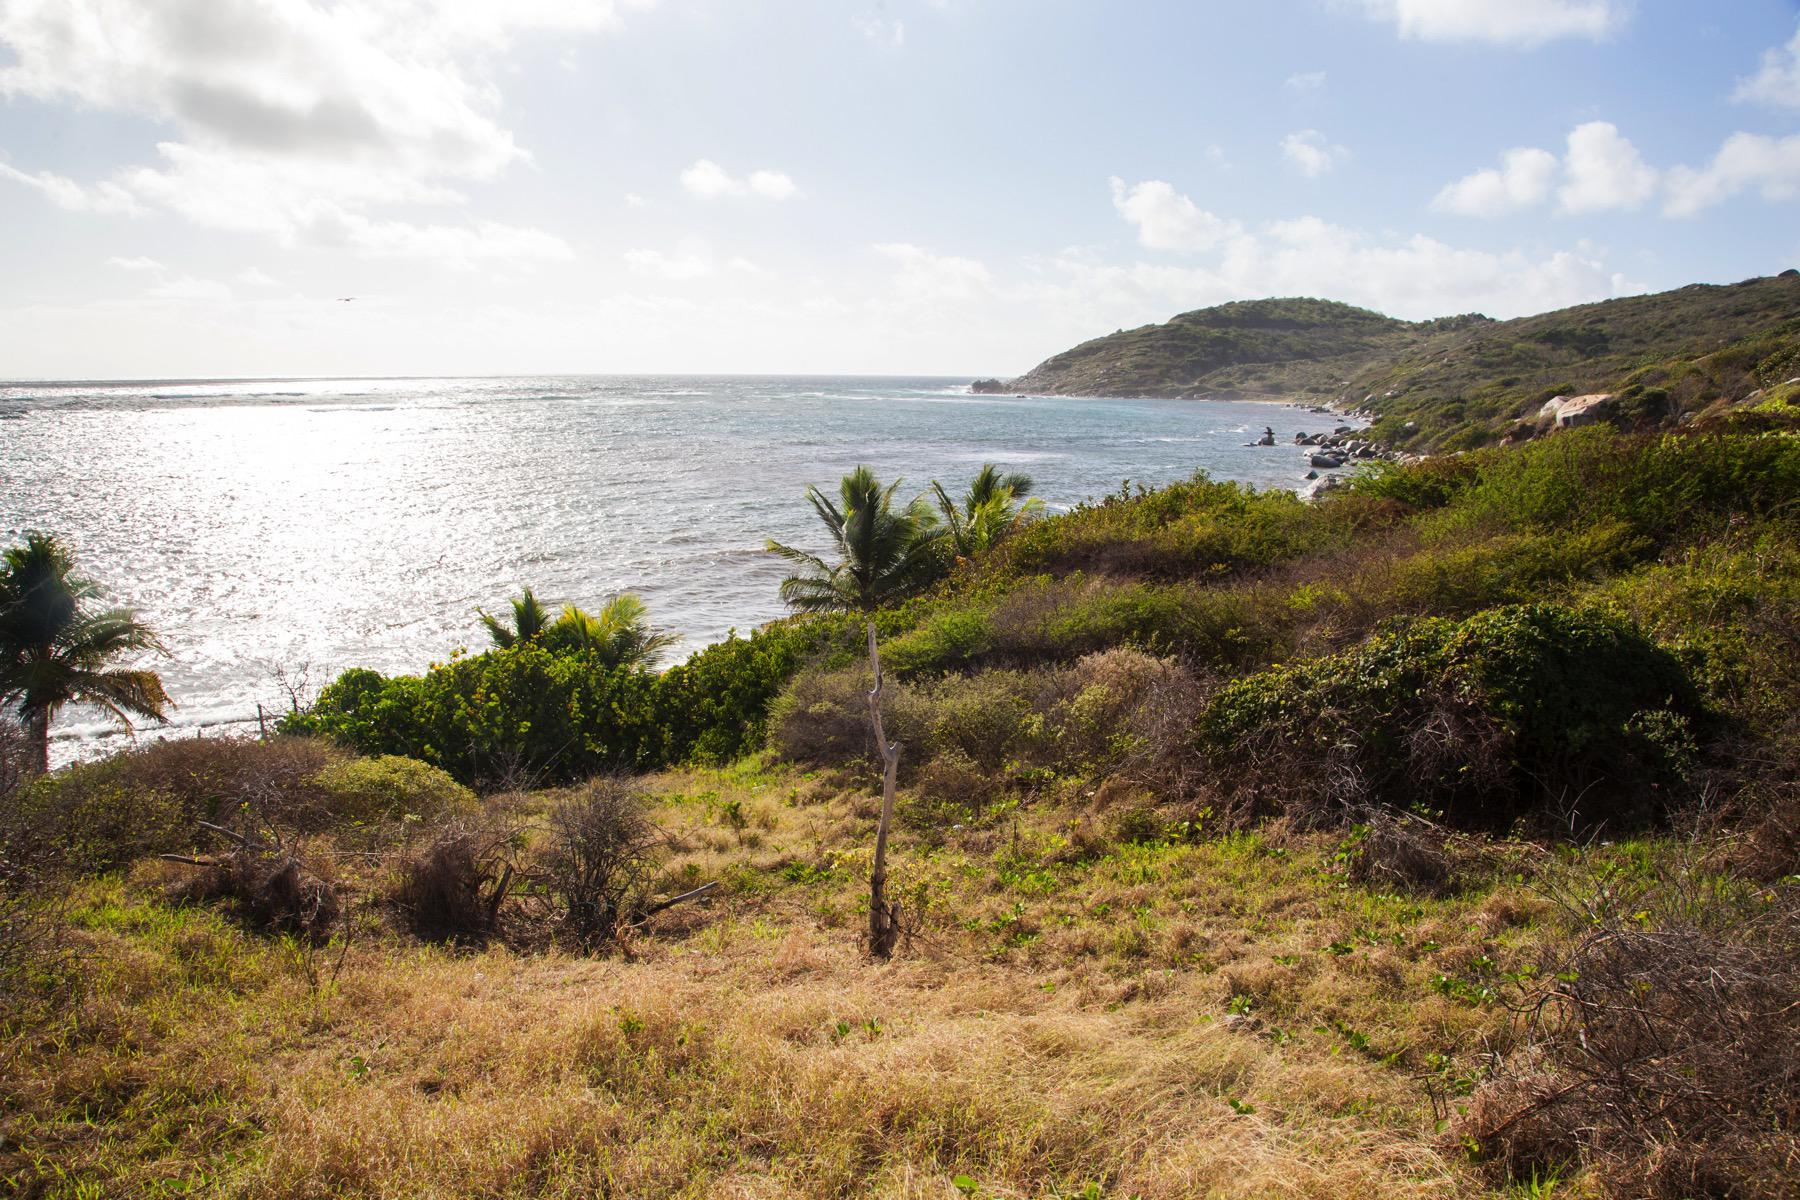 Land for Sale at Windy Hill Waterfront Land 401 Windy Hill, Virgin Gorda British Virgin Islands